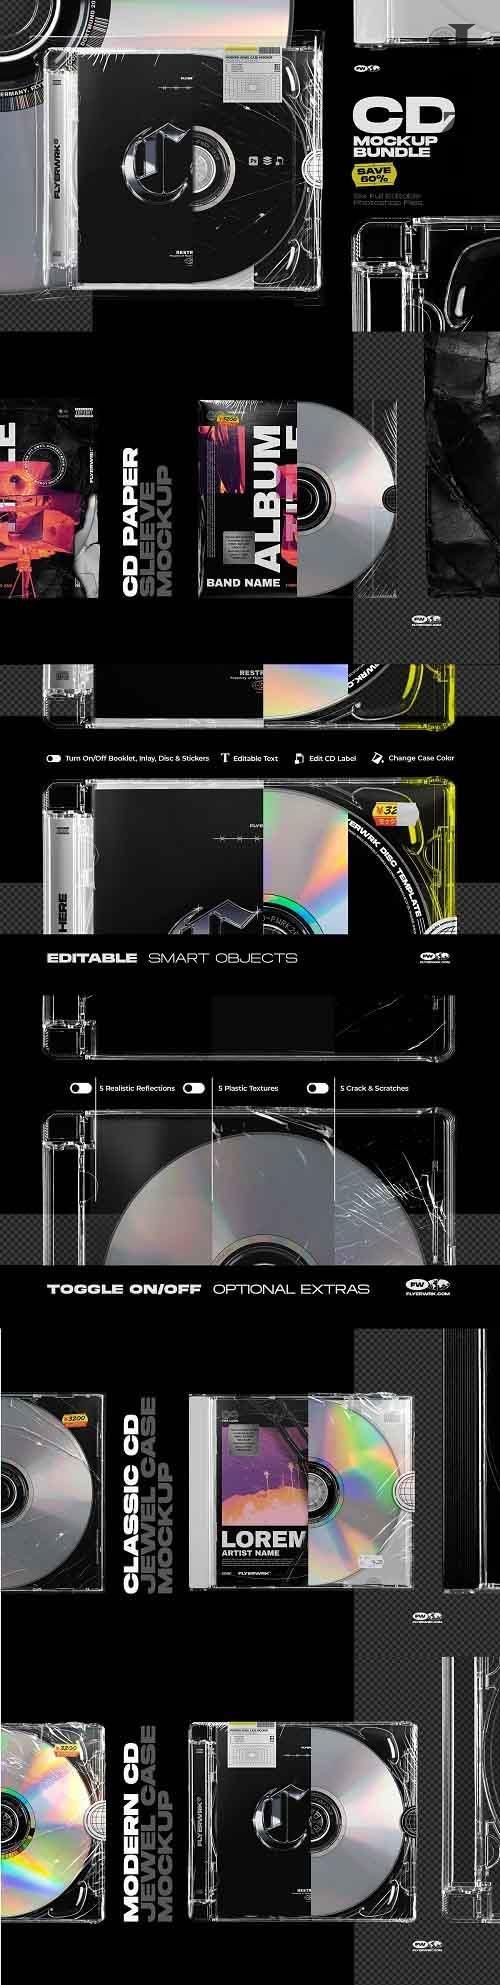 CreativeMarket - CD Mockup Bundle 5485024